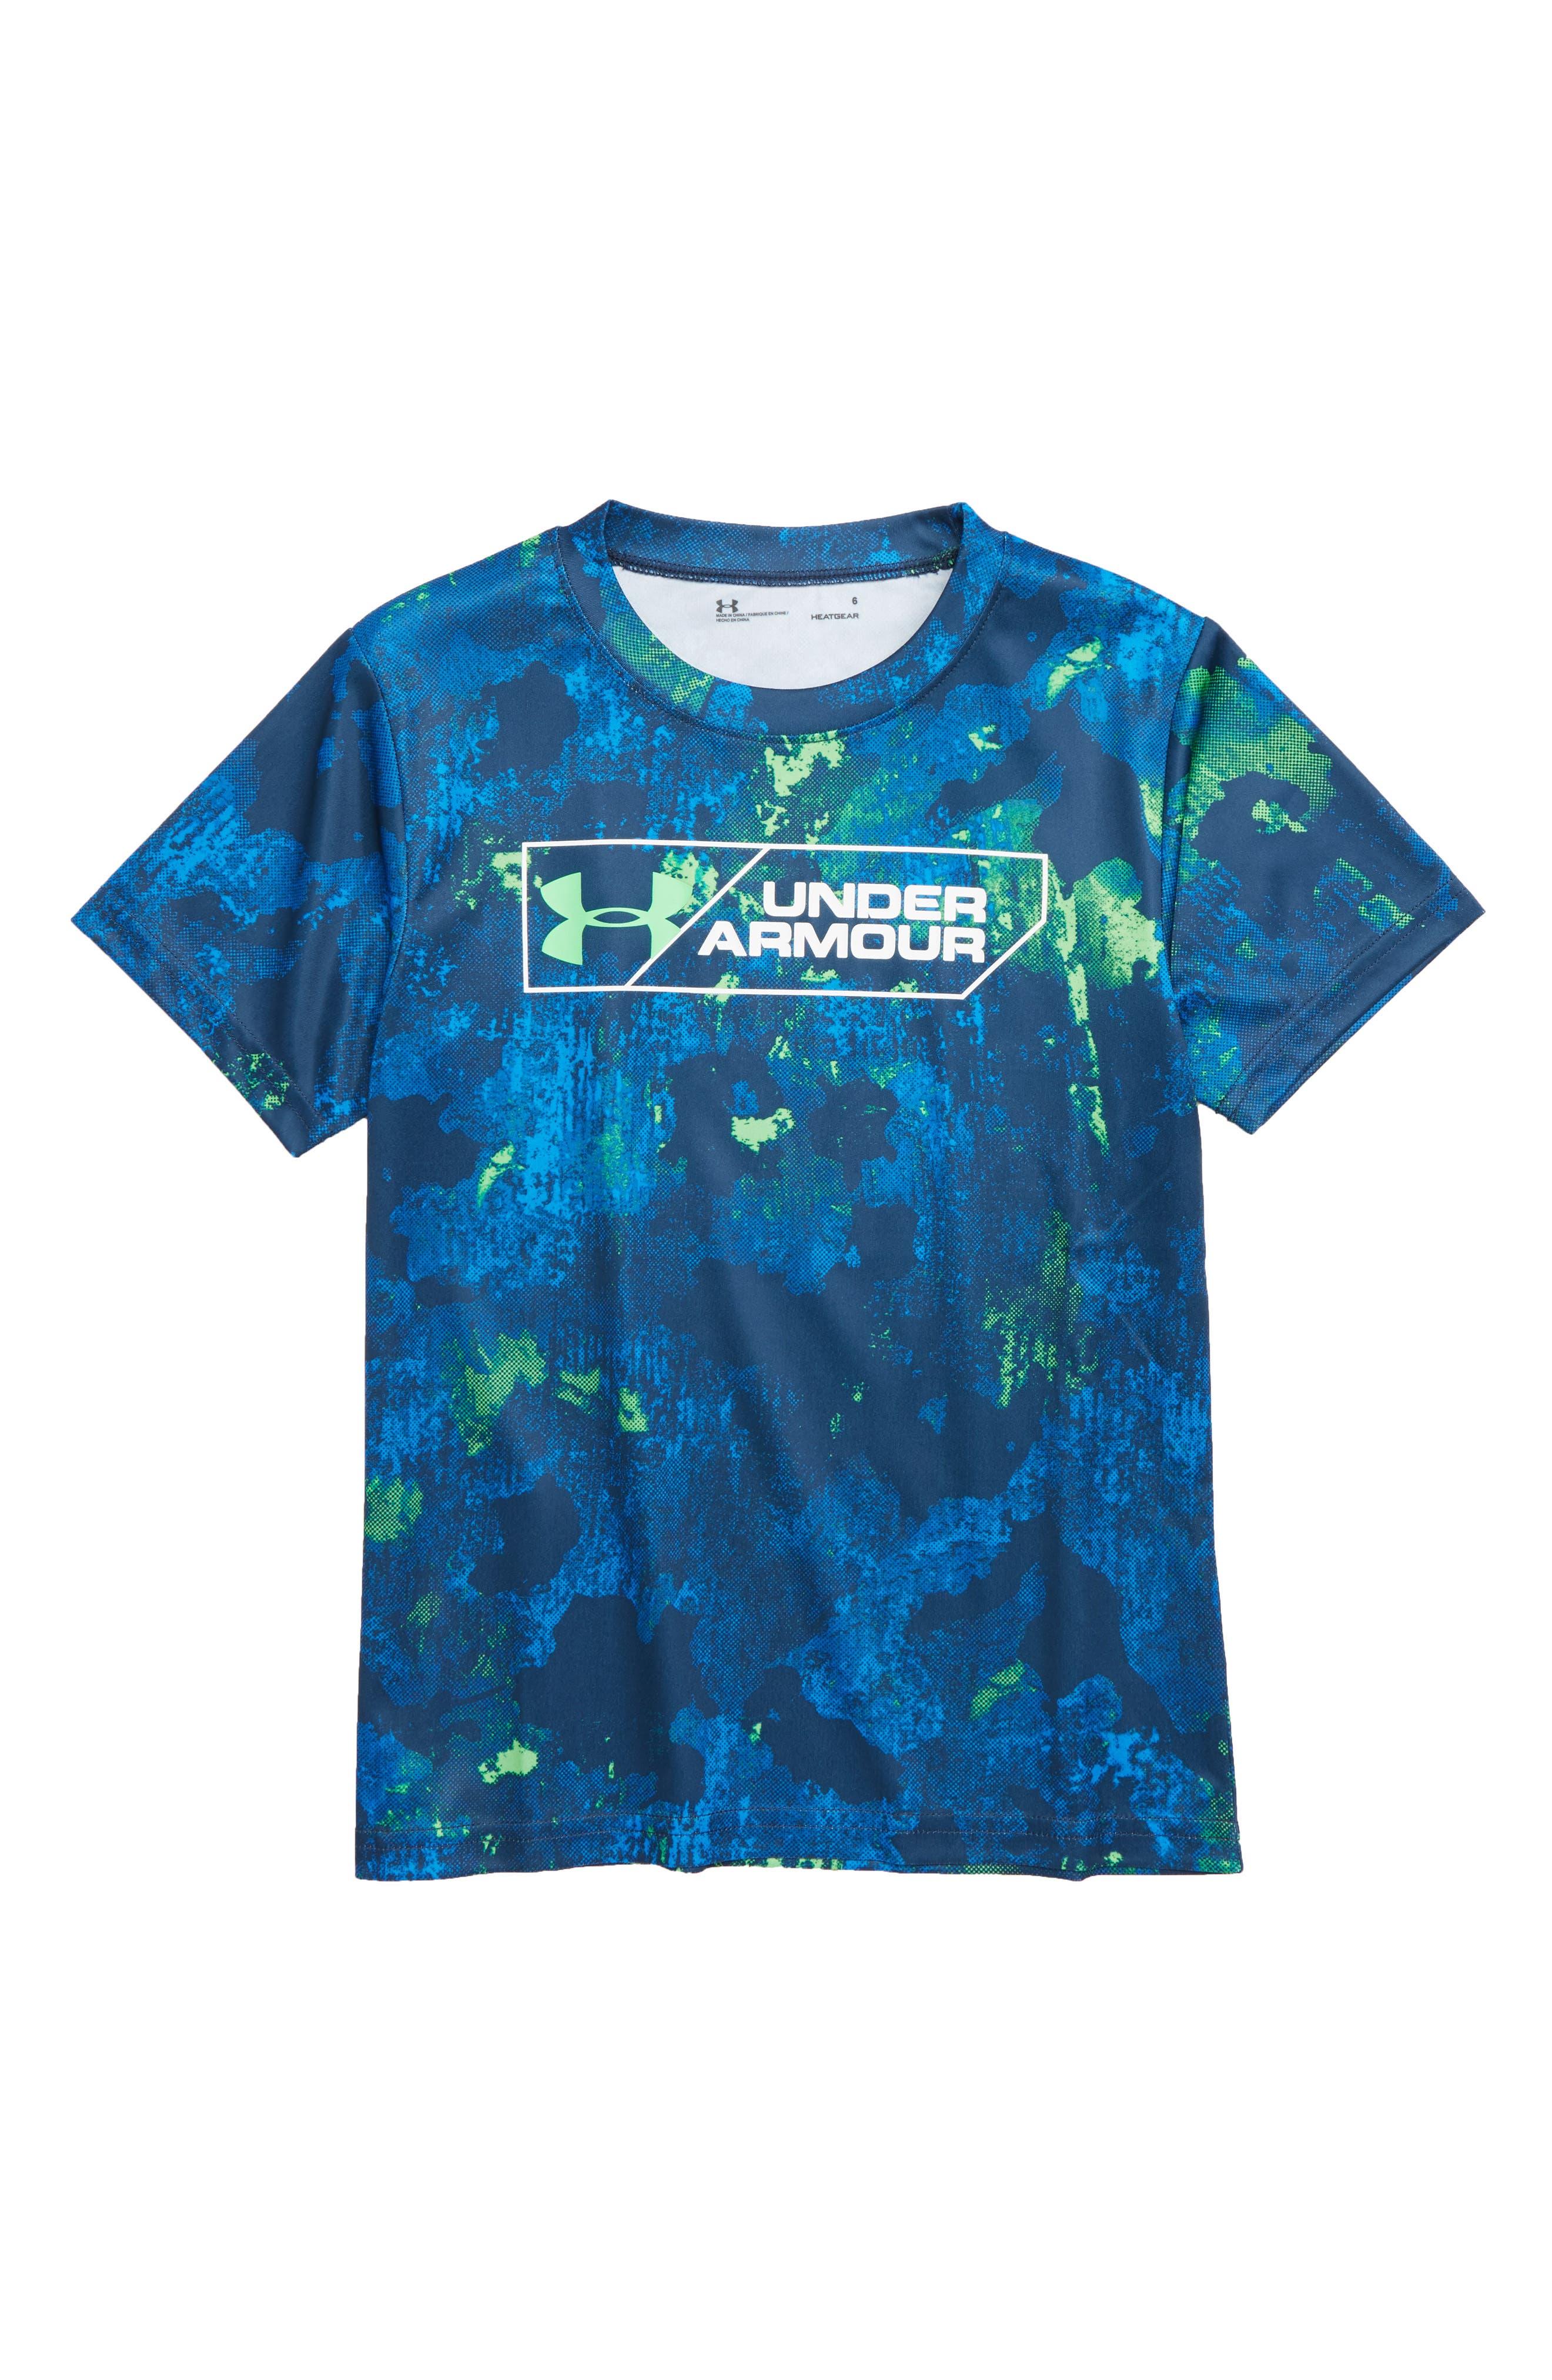 Boys Under Armour Bedrock Camo Shirt